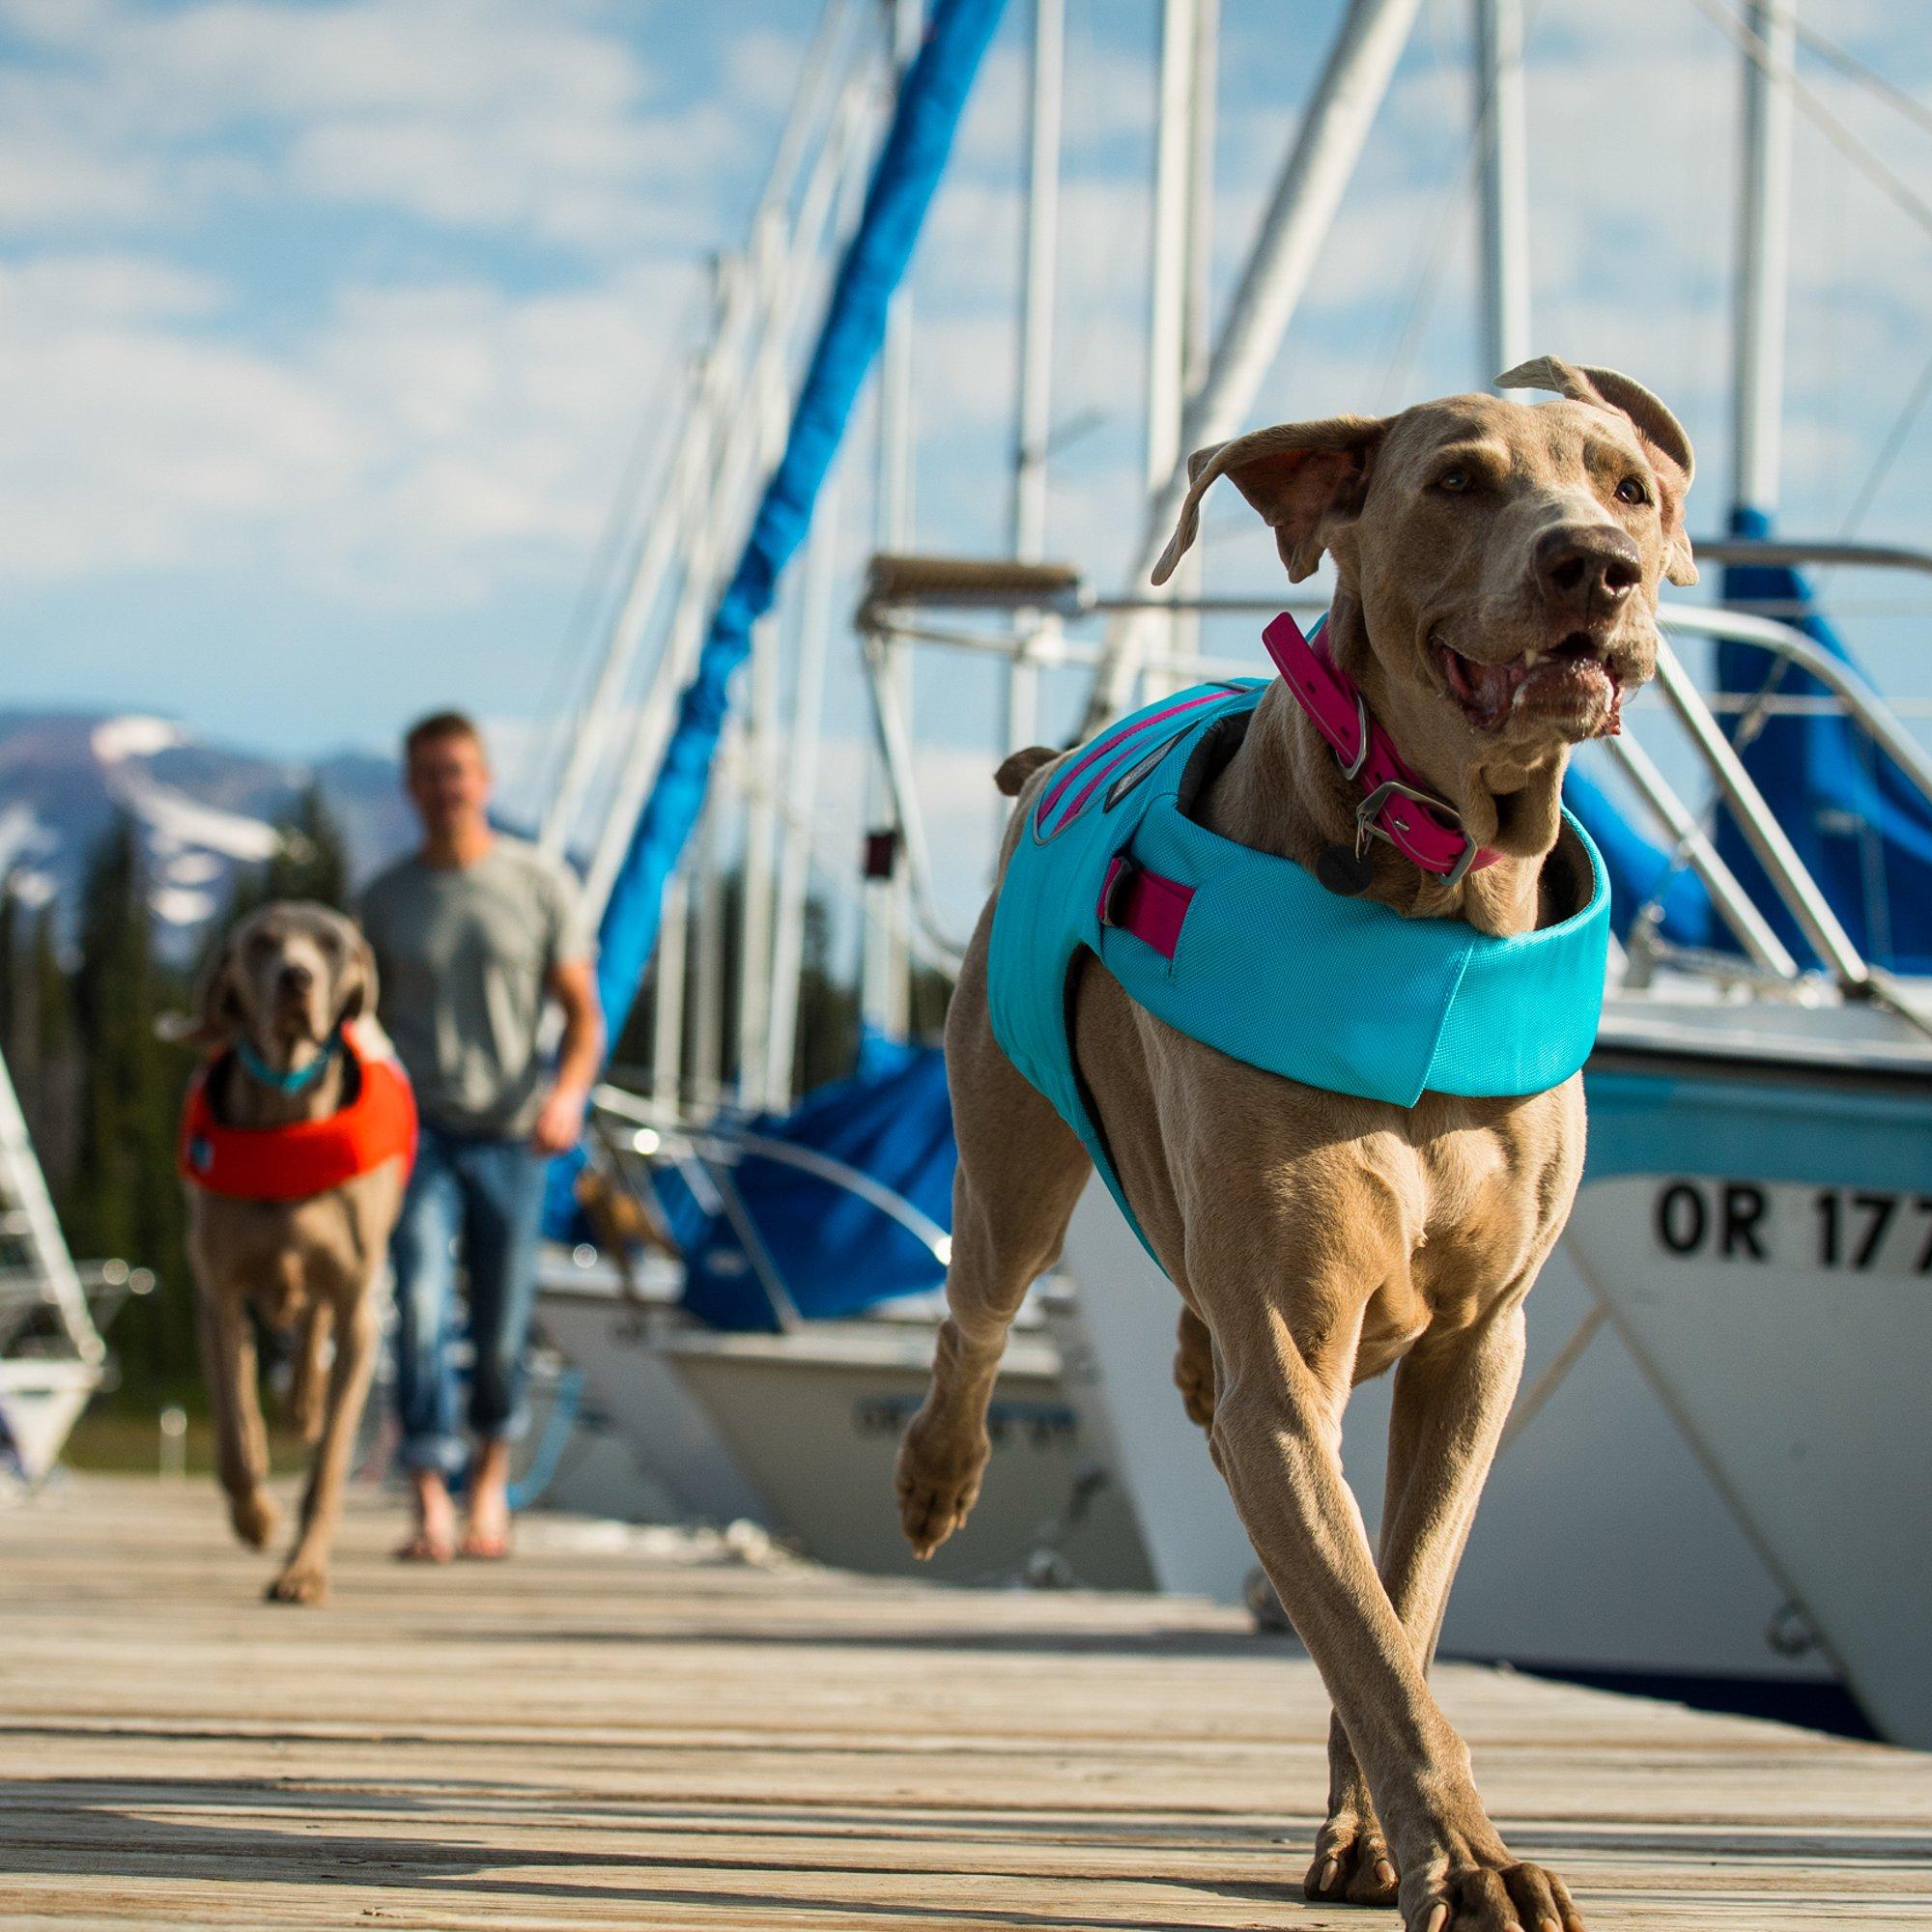 RUFFWEAR - Float Coat Reflective Life Jacket for Dogs, Blue Atoll, Large by RUFFWEAR (Image #8)